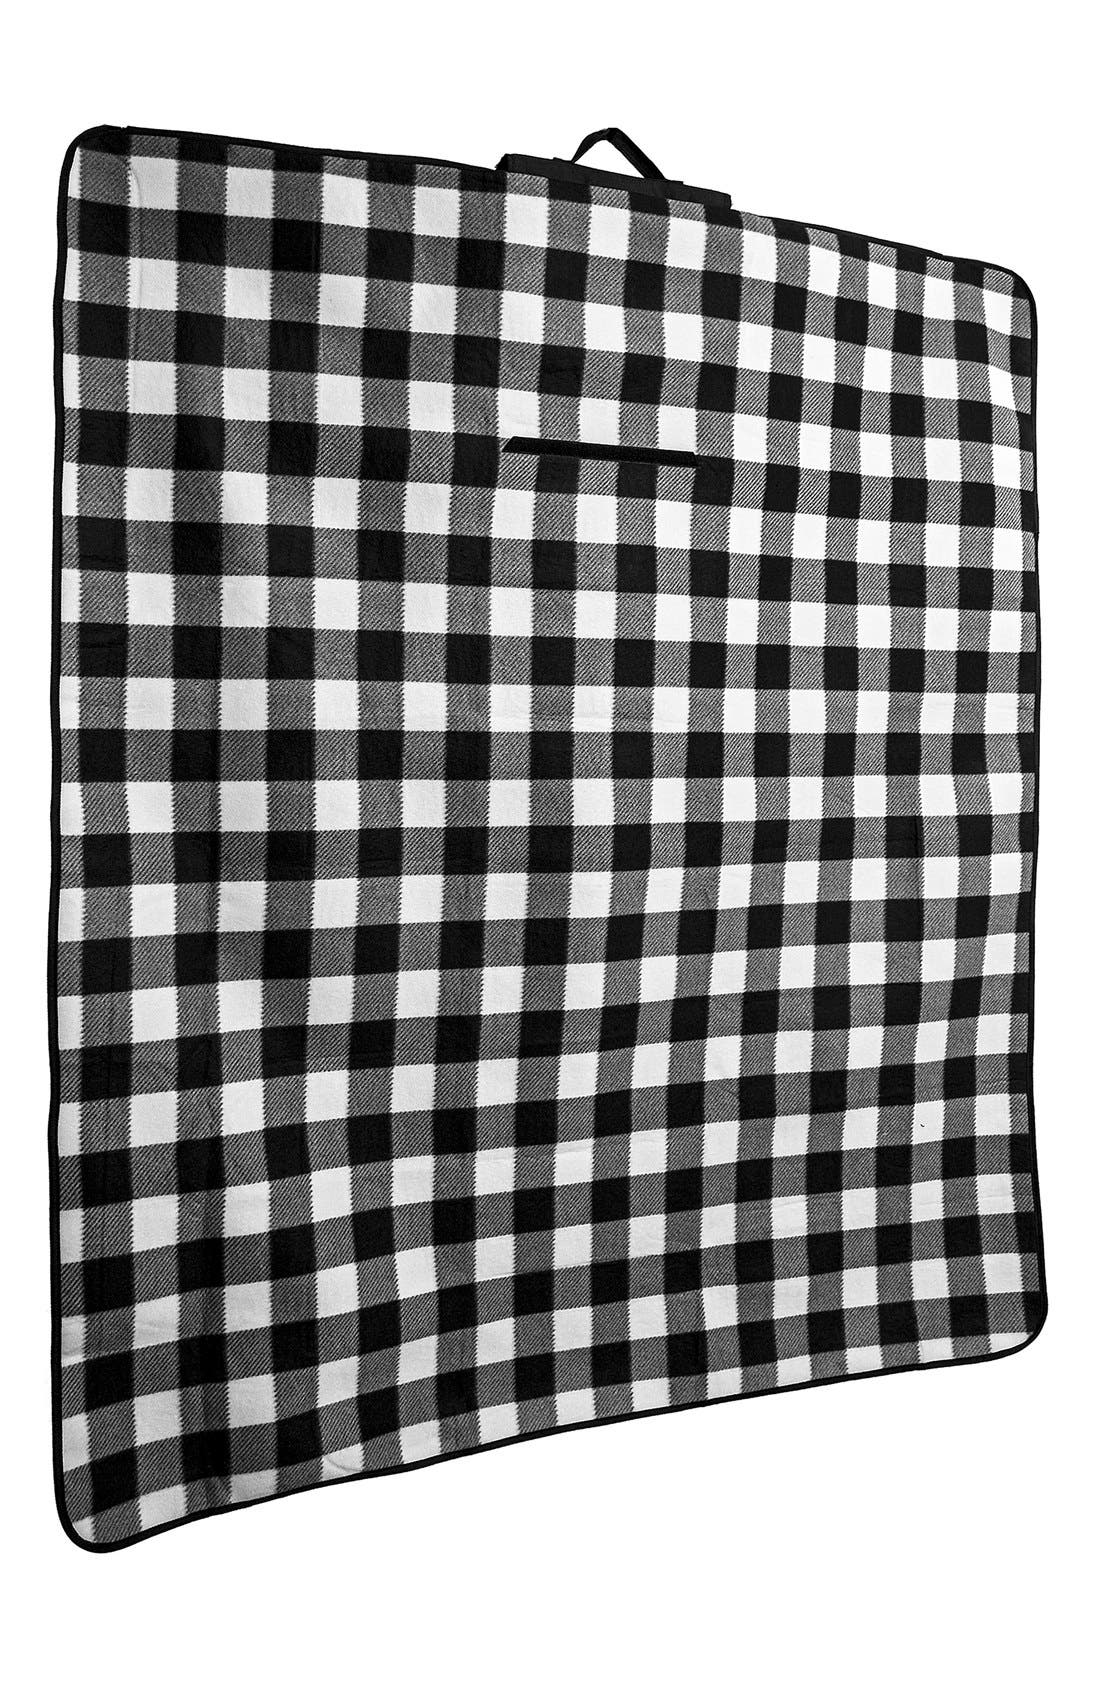 Monogram Plaid Fold-Up Picnic Blanket,                             Alternate thumbnail 6, color,                             018